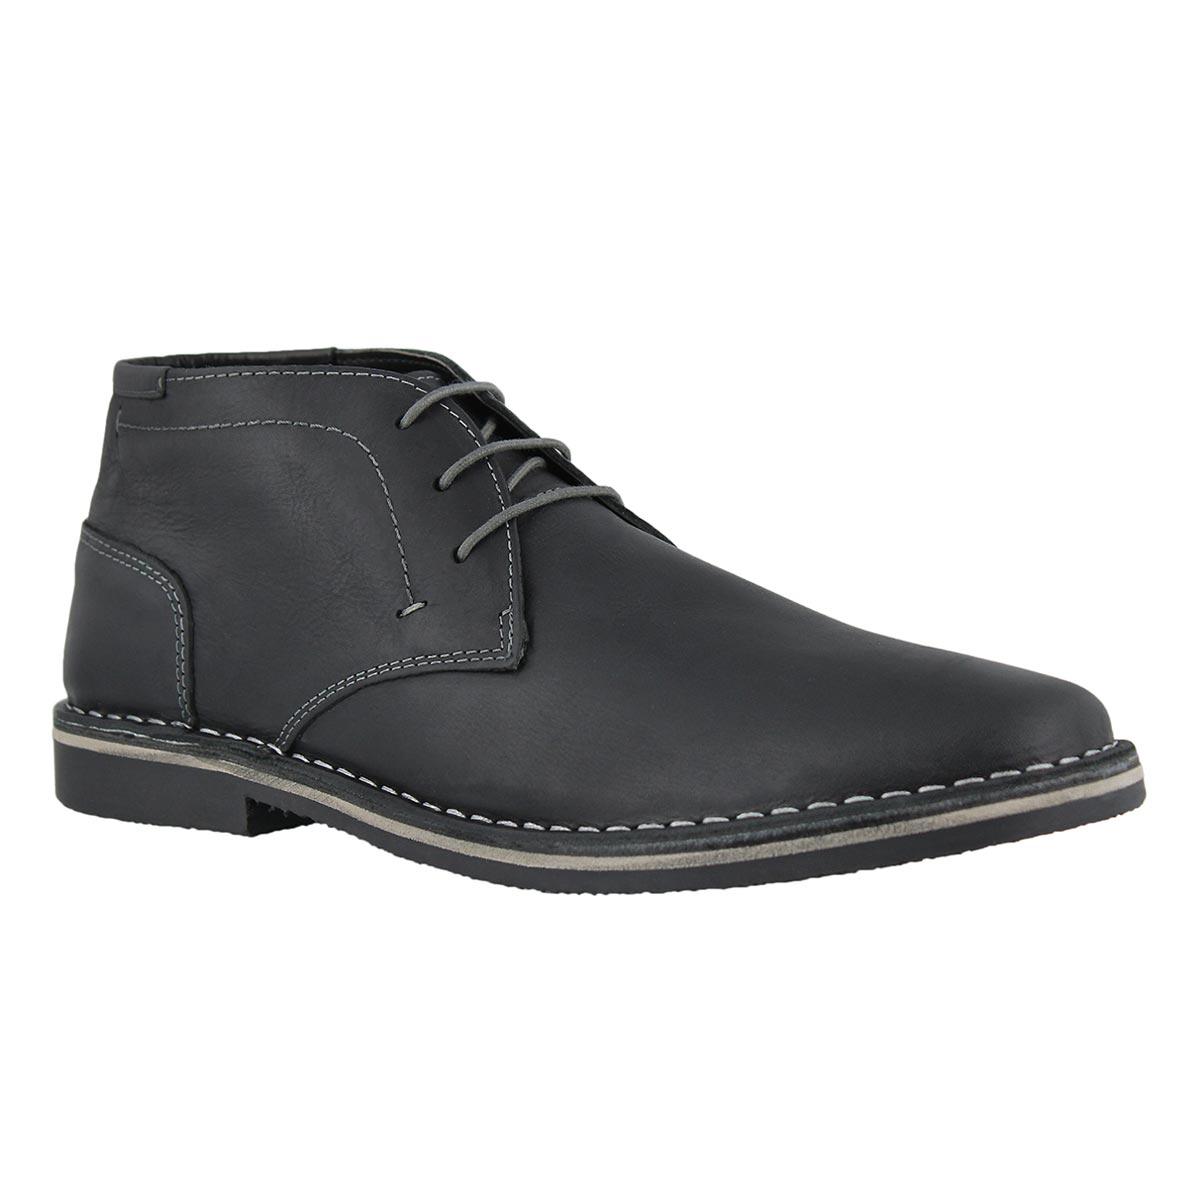 Mns Harken black laceup ankle boot